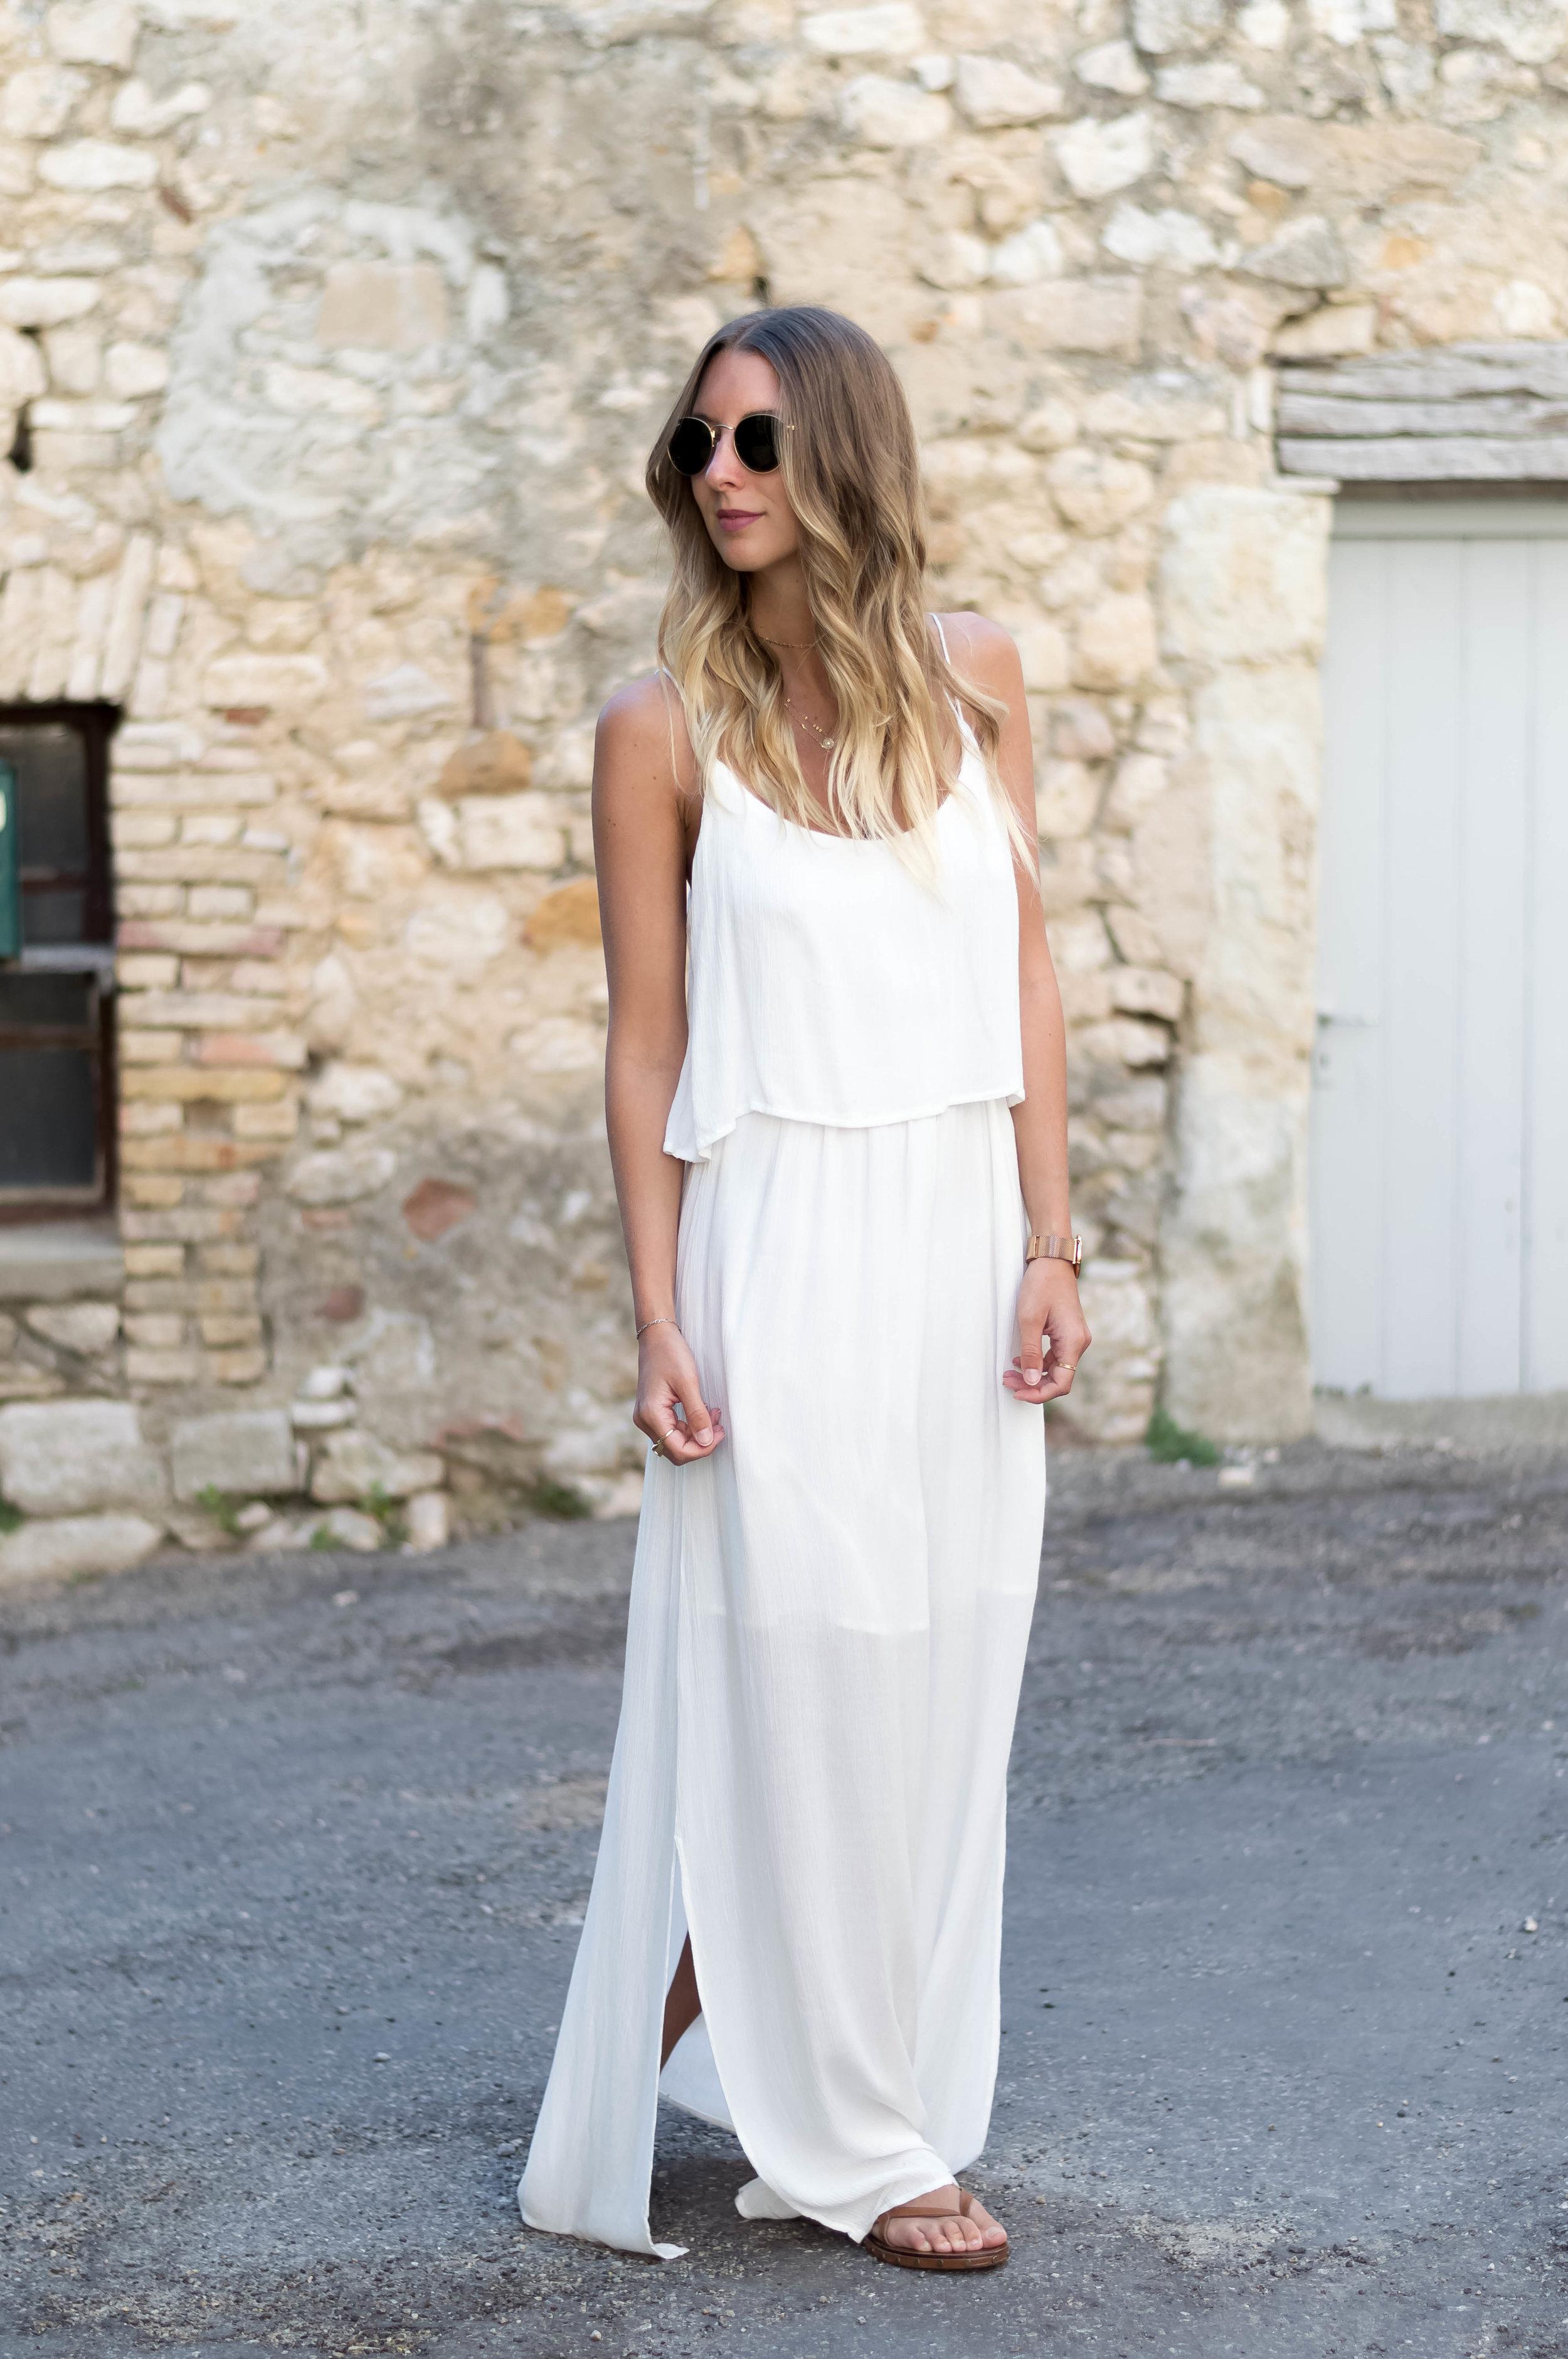 White Dress - OSIARAH.COM (3 sur 16).jpg